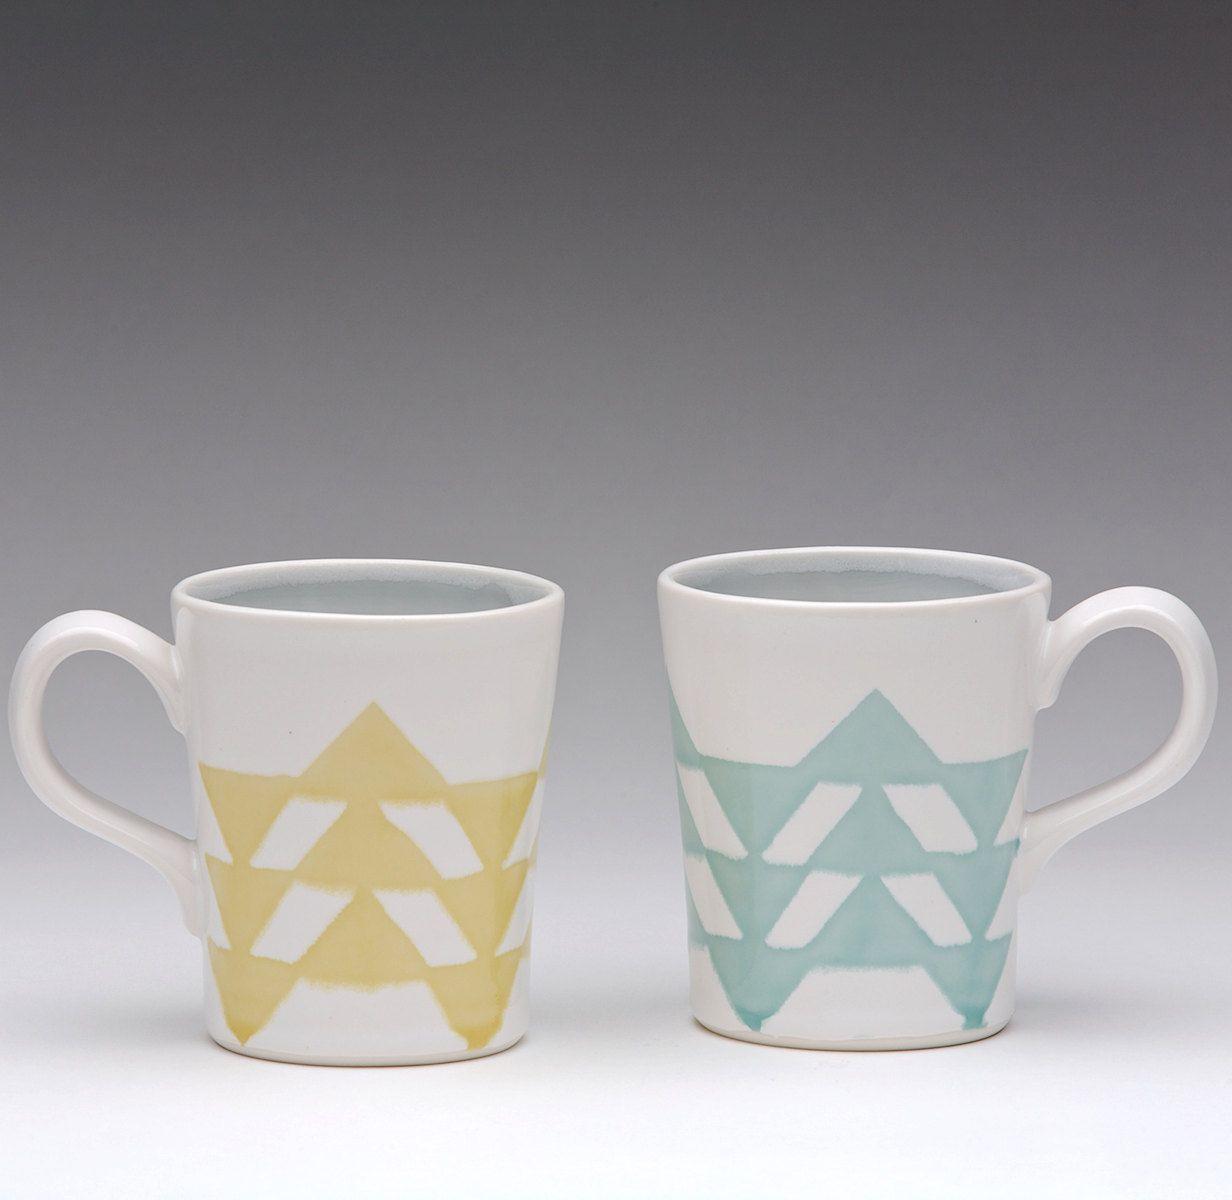 Triangle Mugs